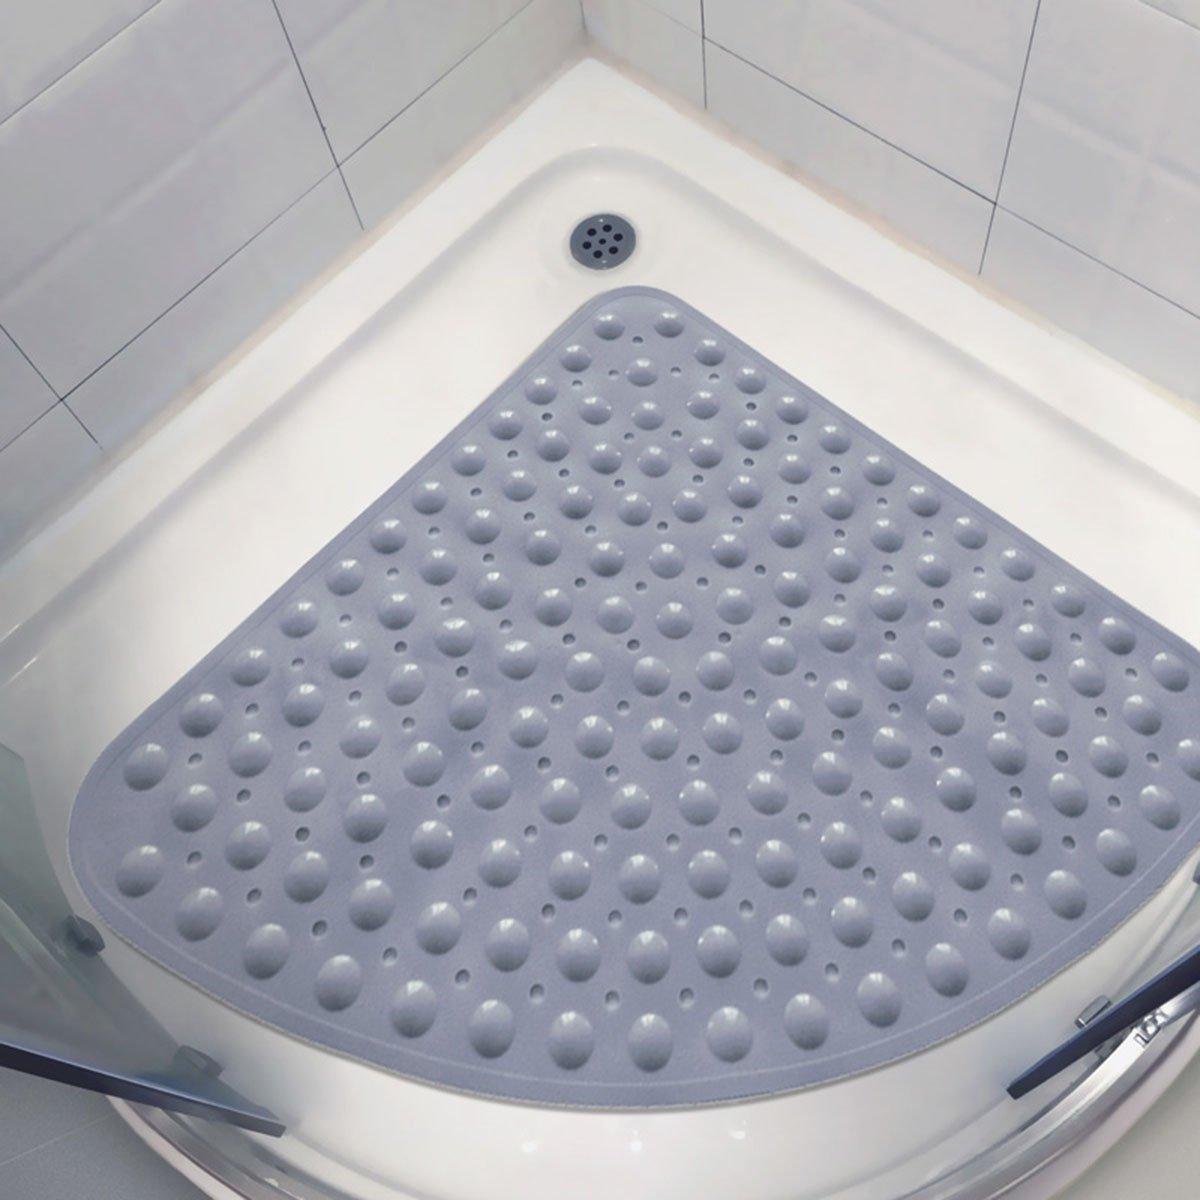 grigio Tappetino per vasca antiscivolo 54x54CM Tappetino per doccia angolare Sector Tappetino per vasca antiscivolo antiscivolo